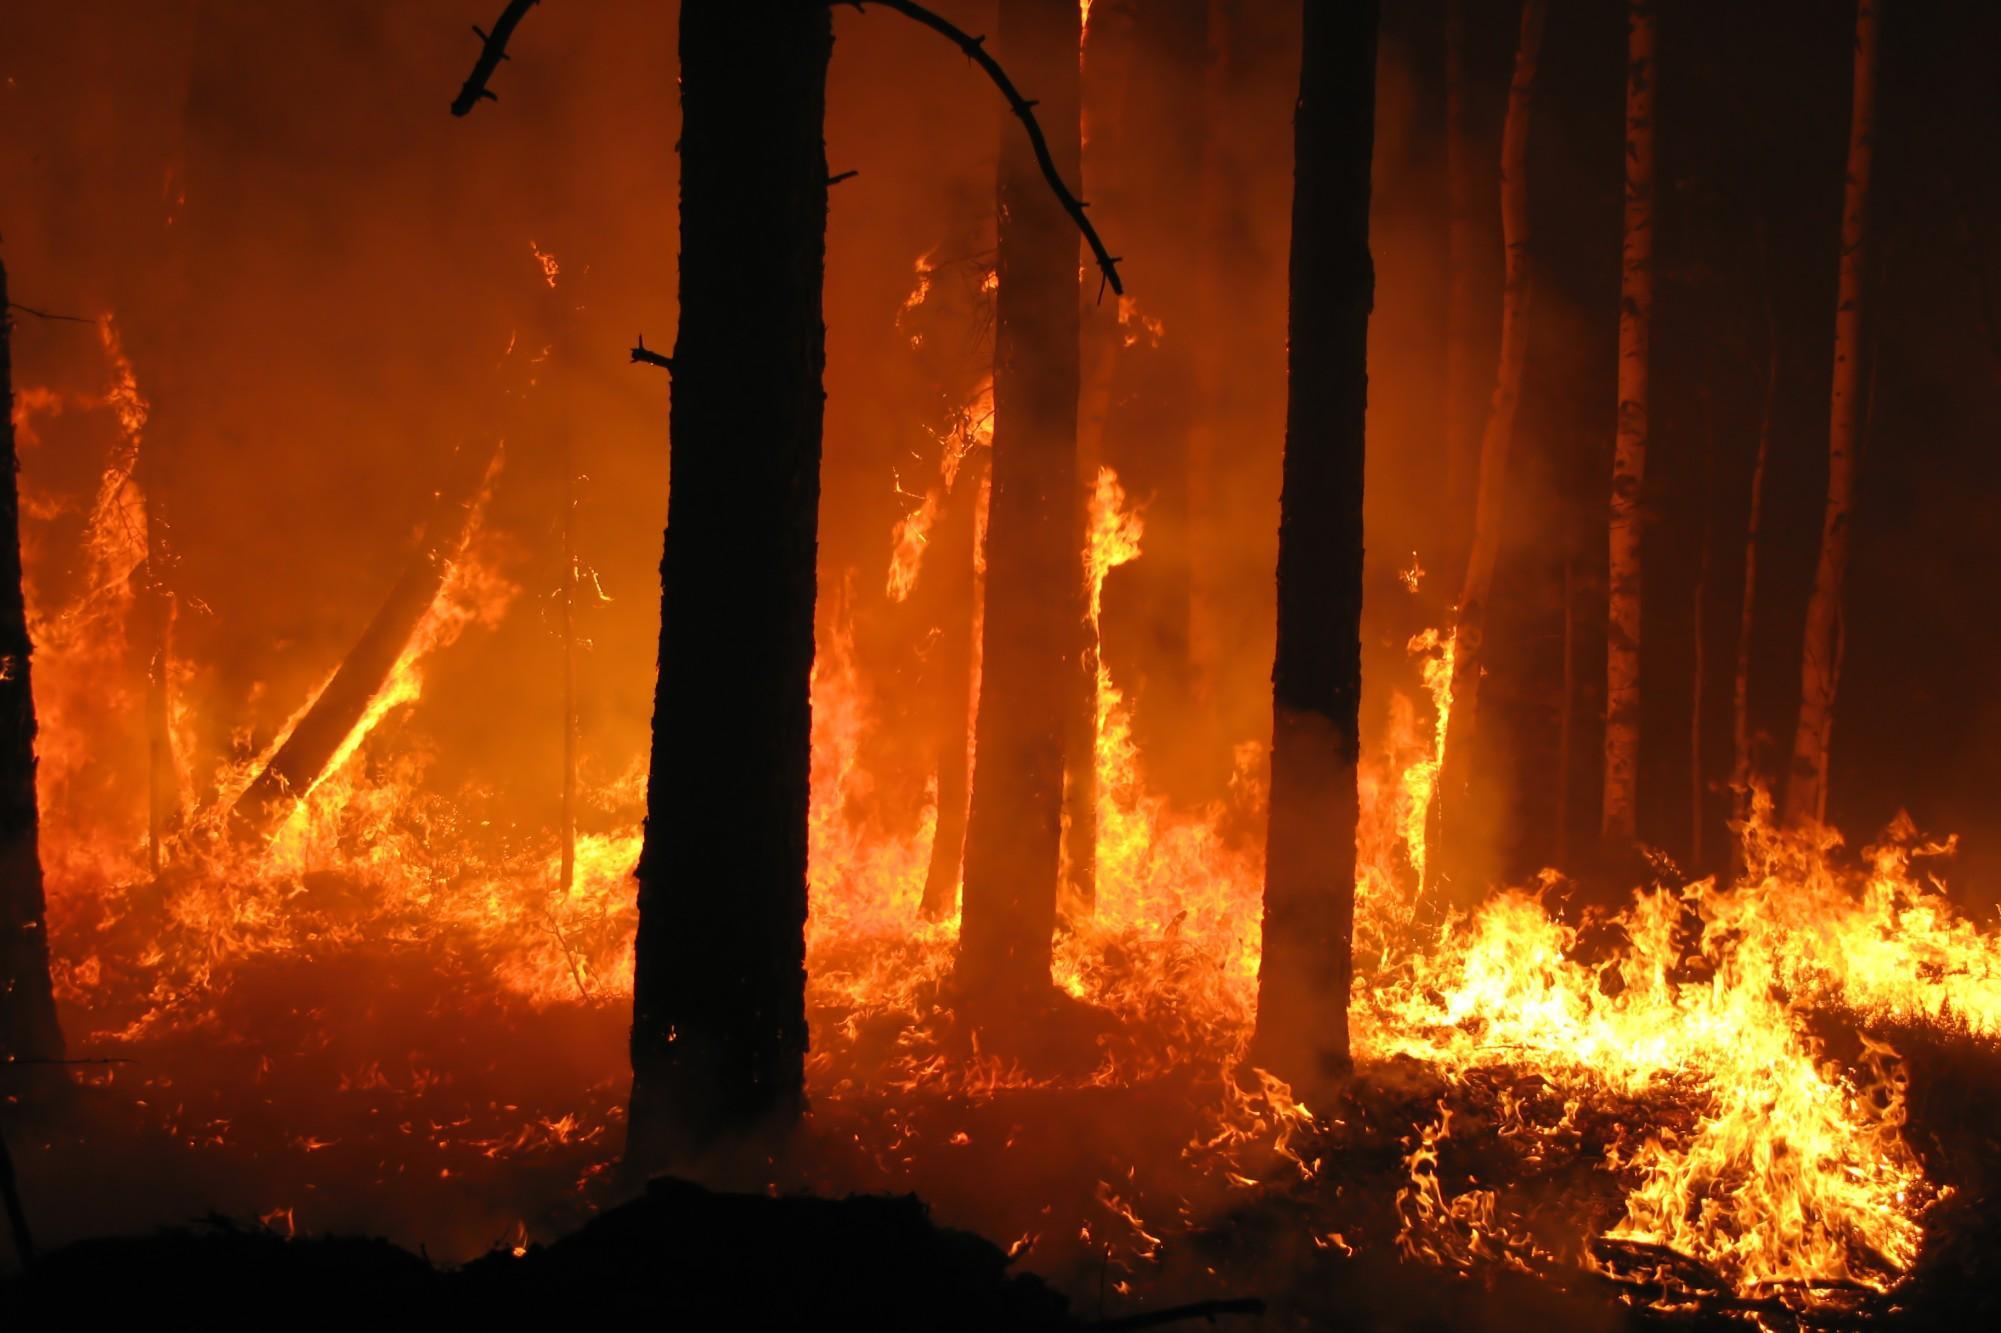 incendio notturno a Cattolica Eraclea